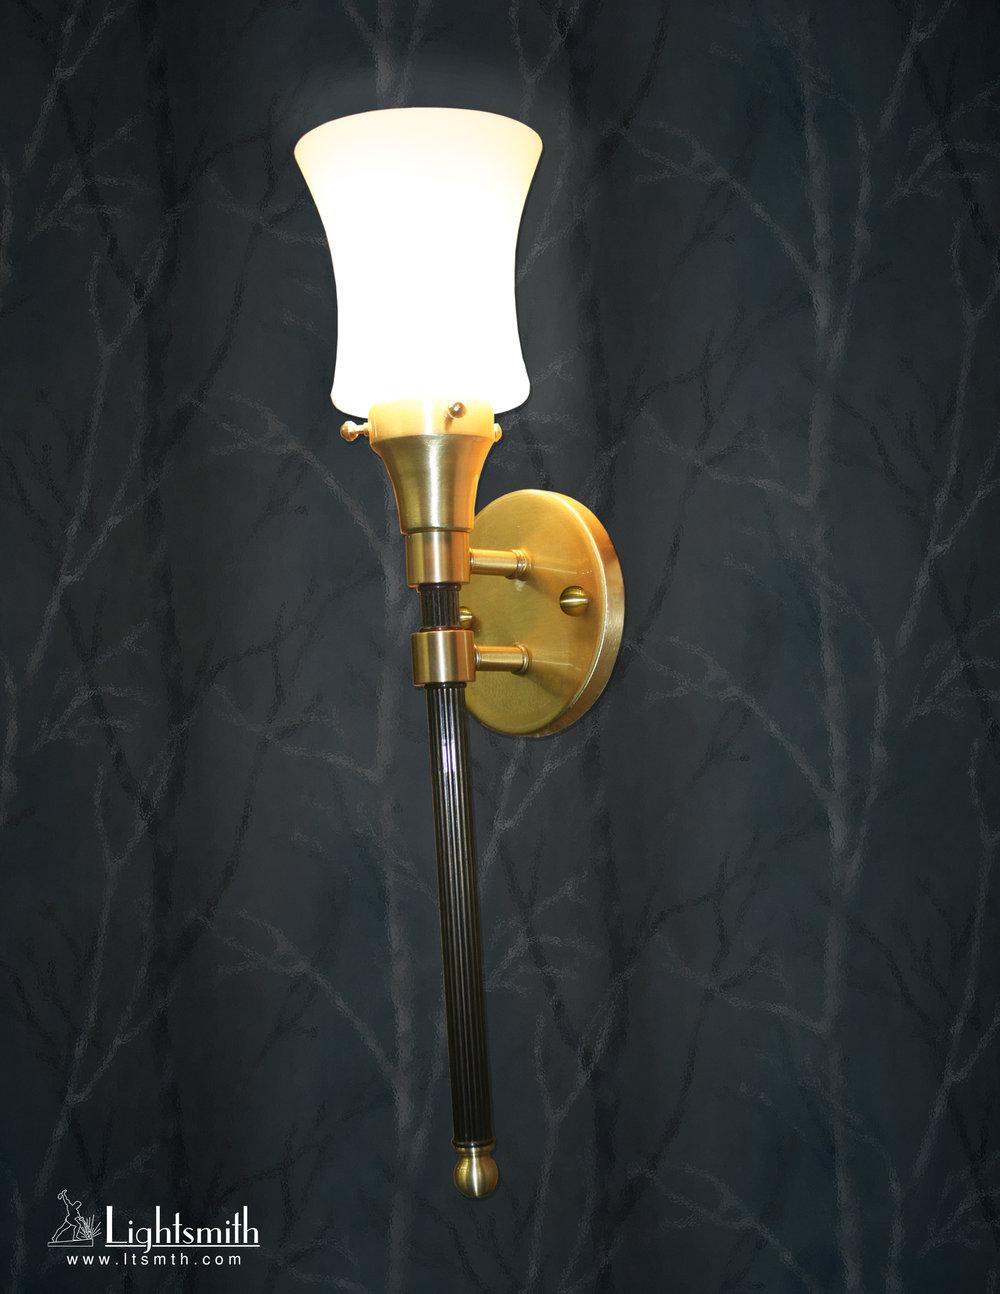 SC-8600 - Satin Brass - Antique Brass -  White Opal Glass